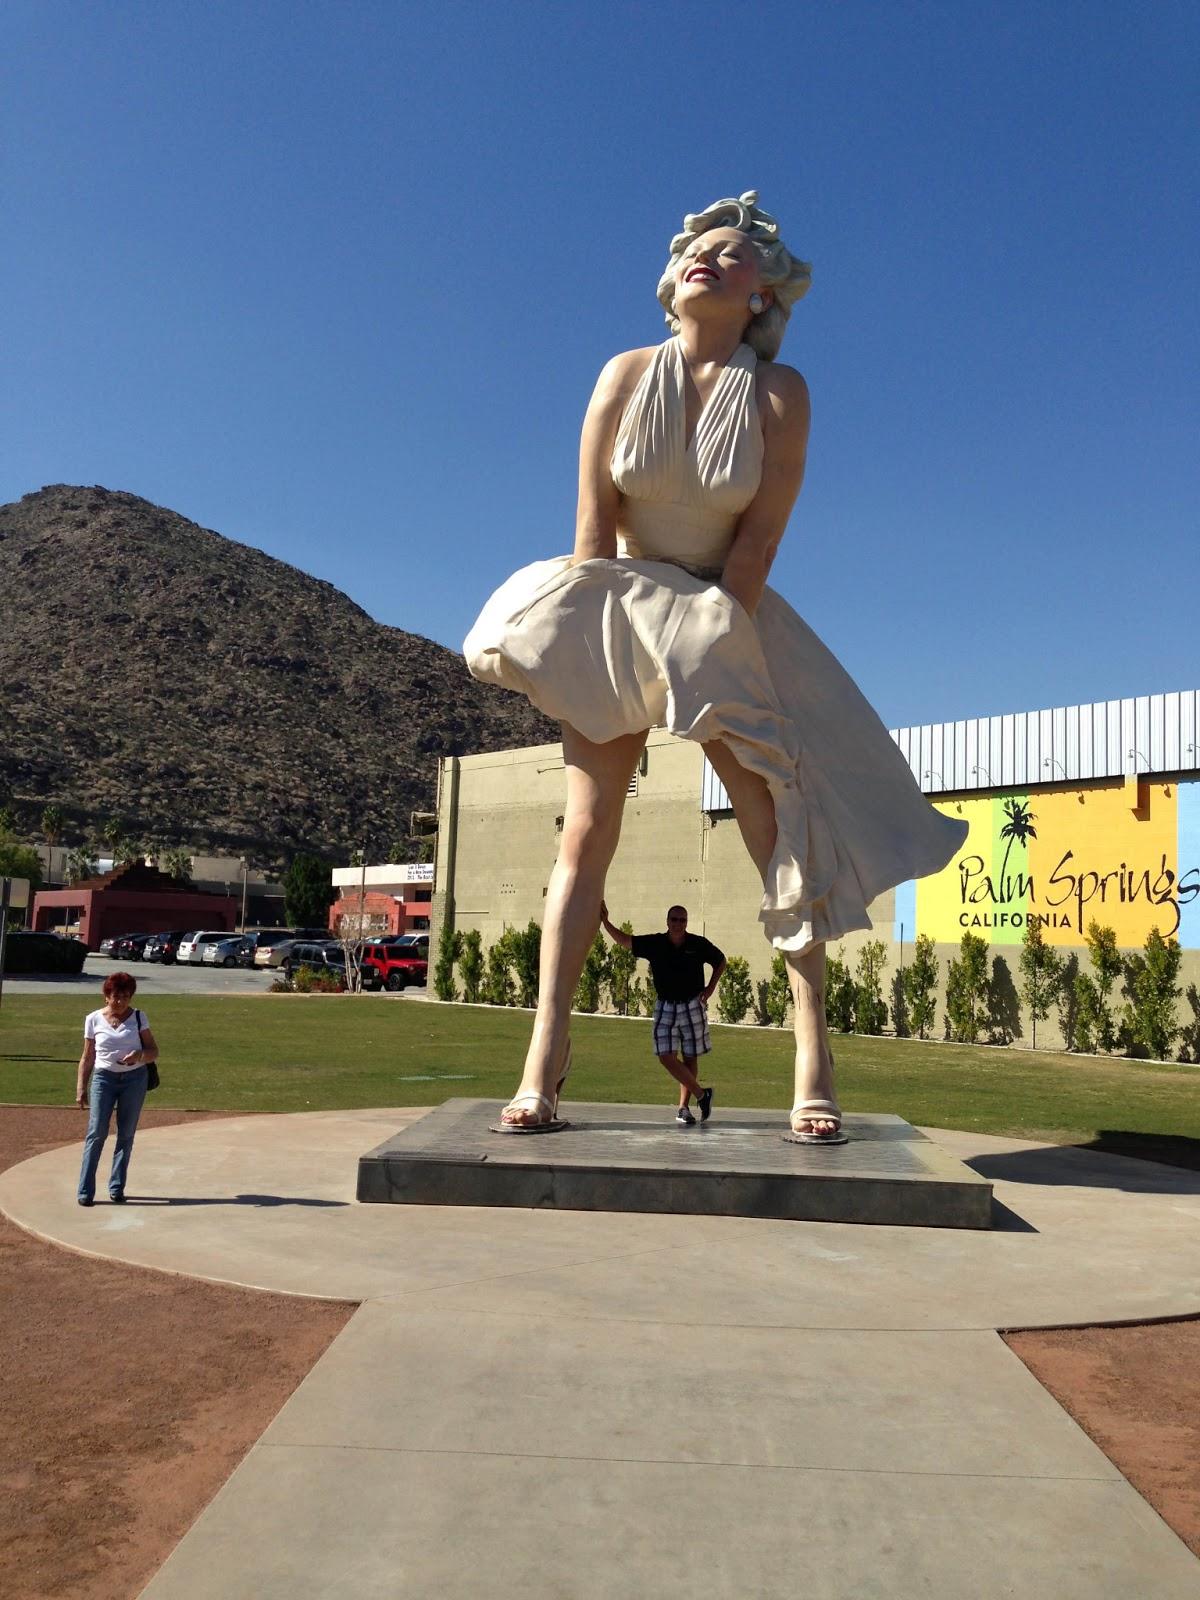 http://2.bp.blogspot.com/-64fOaVc2Ins/UT4E06n1LyI/AAAAAAAAAL4/ttjZ_oPQEqc/s1600/Statue.jpg